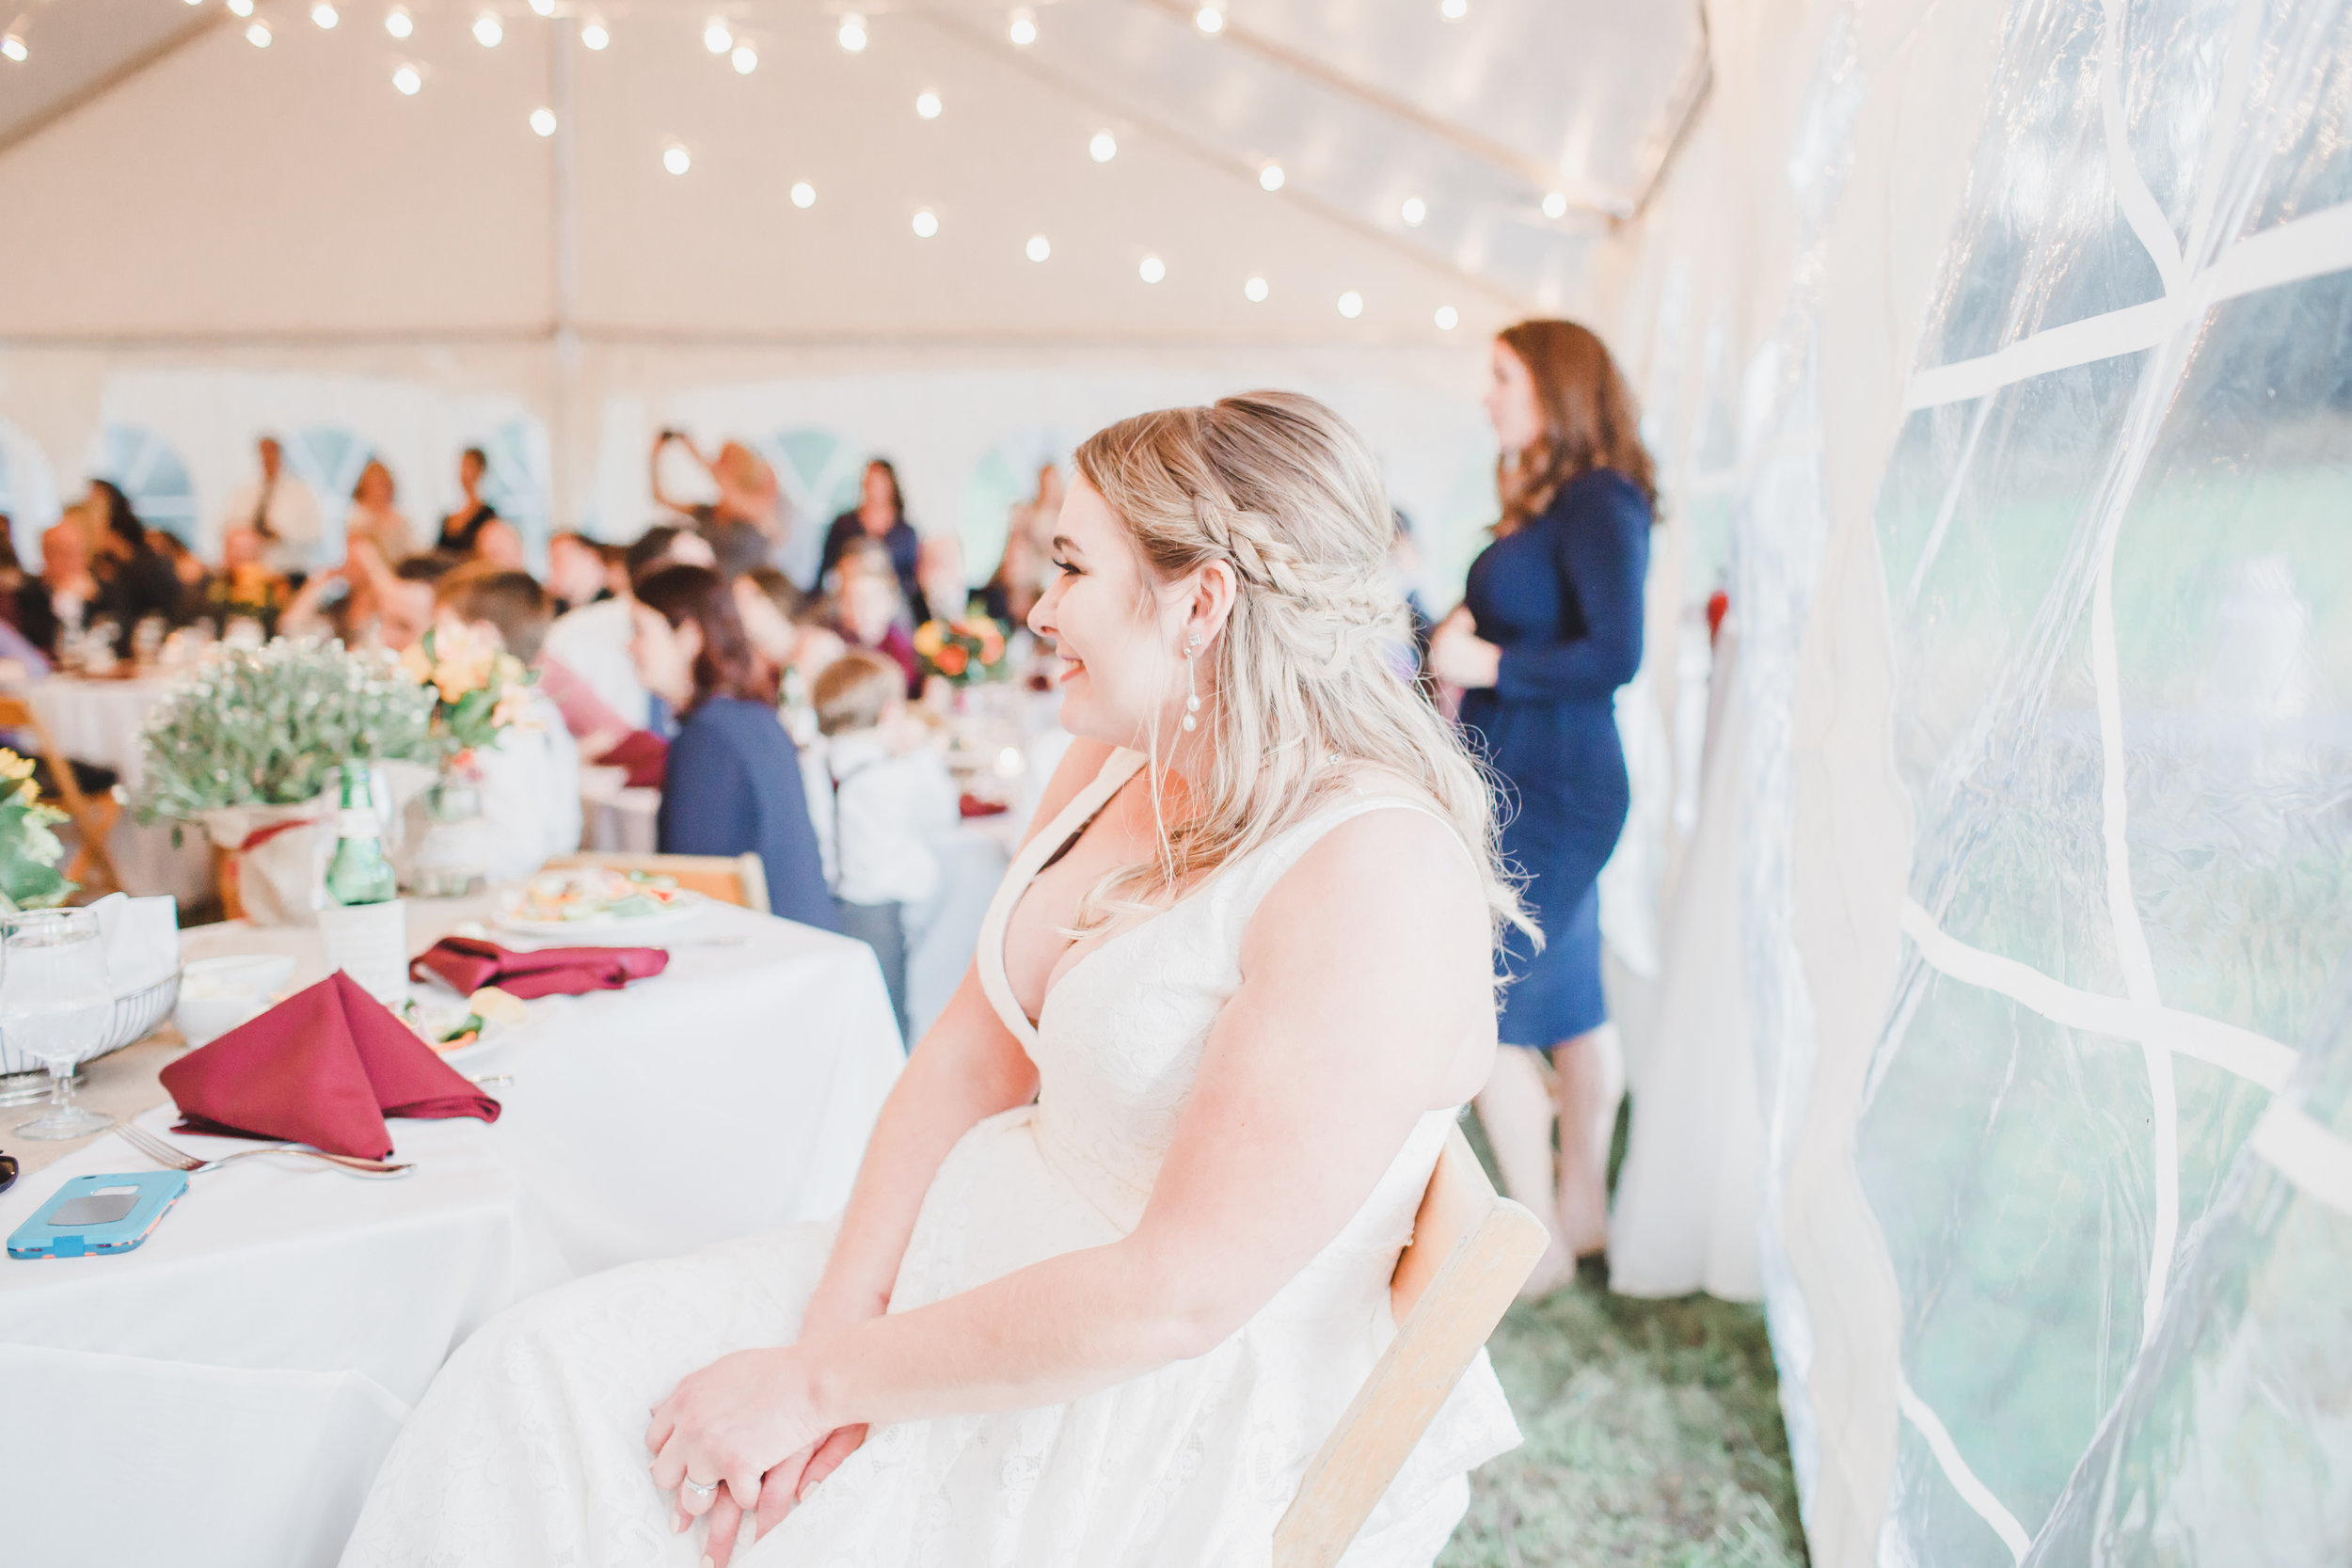 Fling - Virginia Wedding Photographer - Photography by Amy Nicole-4568-18.jpg